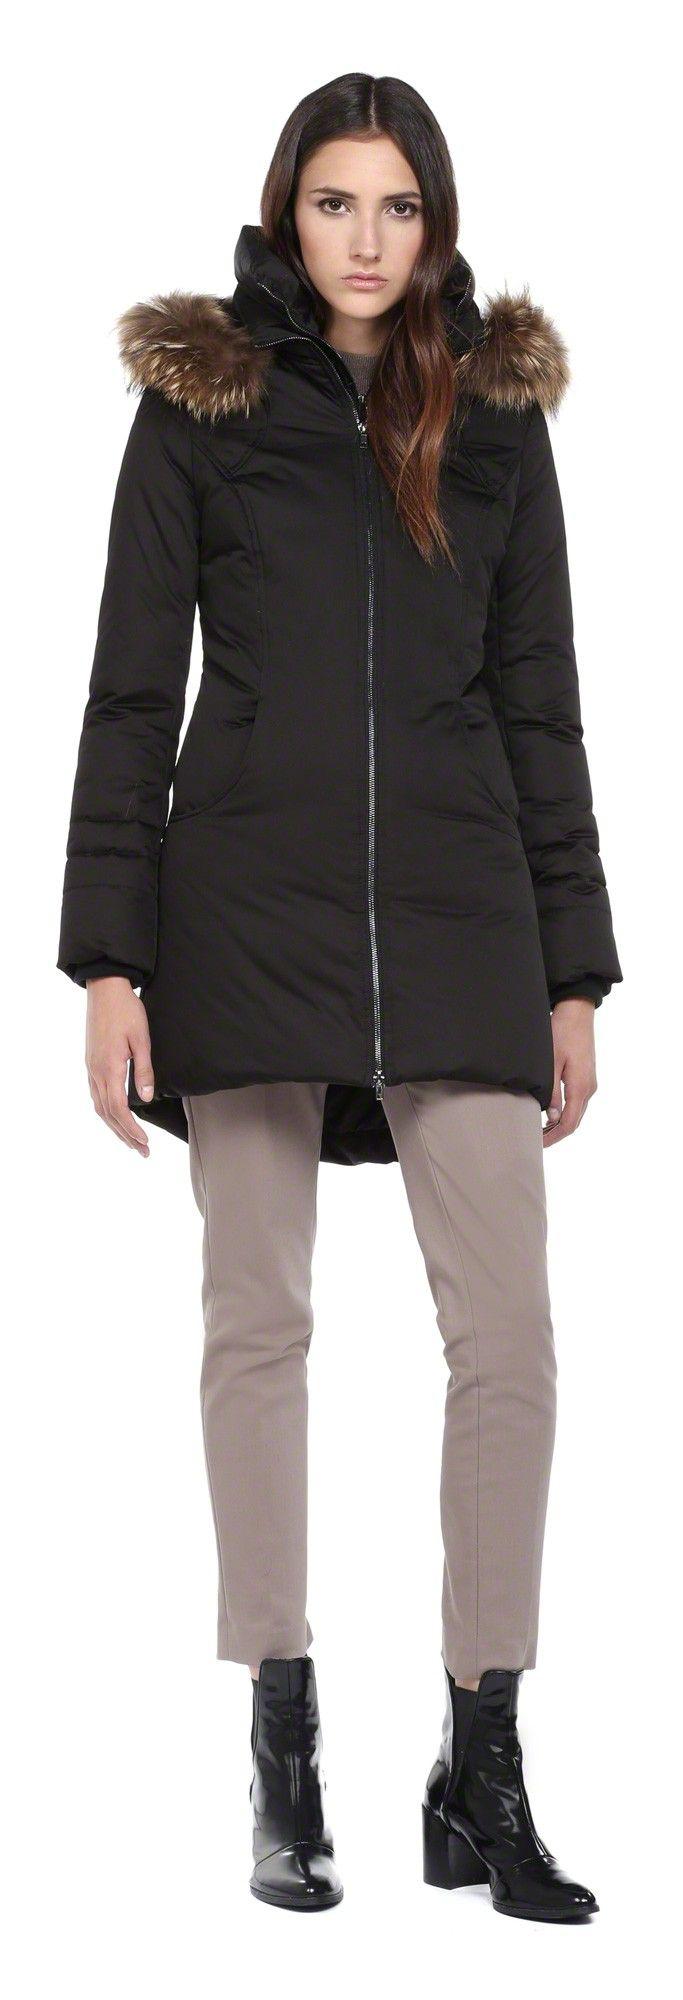 Best 10+ Coat with fur hood ideas on Pinterest | J crew nyc, J ...